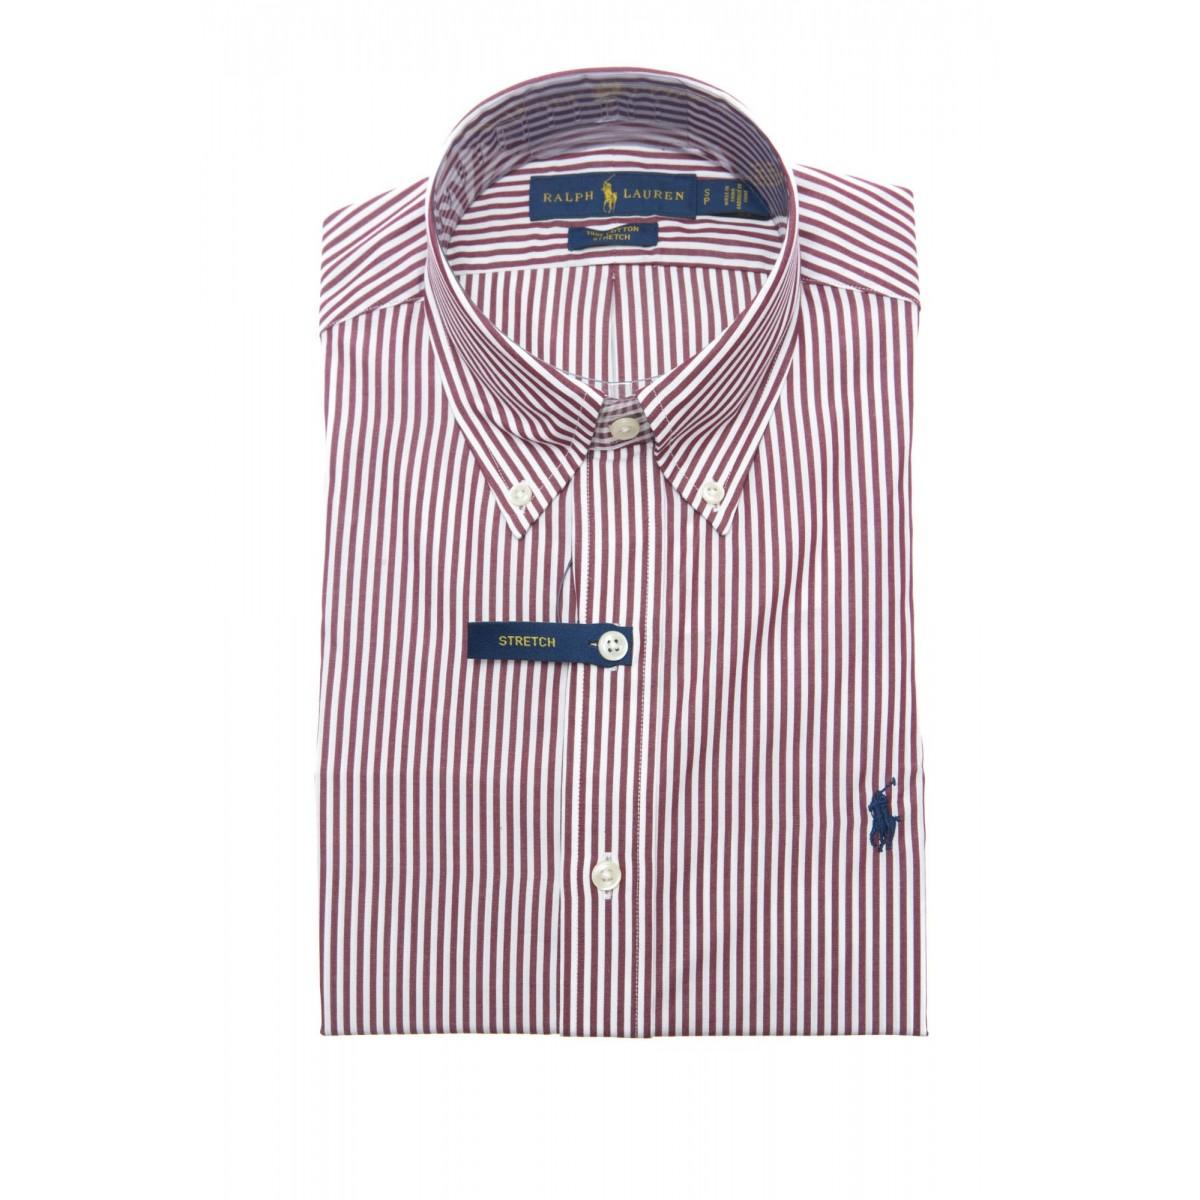 Camicia - 712696 007 camicia custom fit